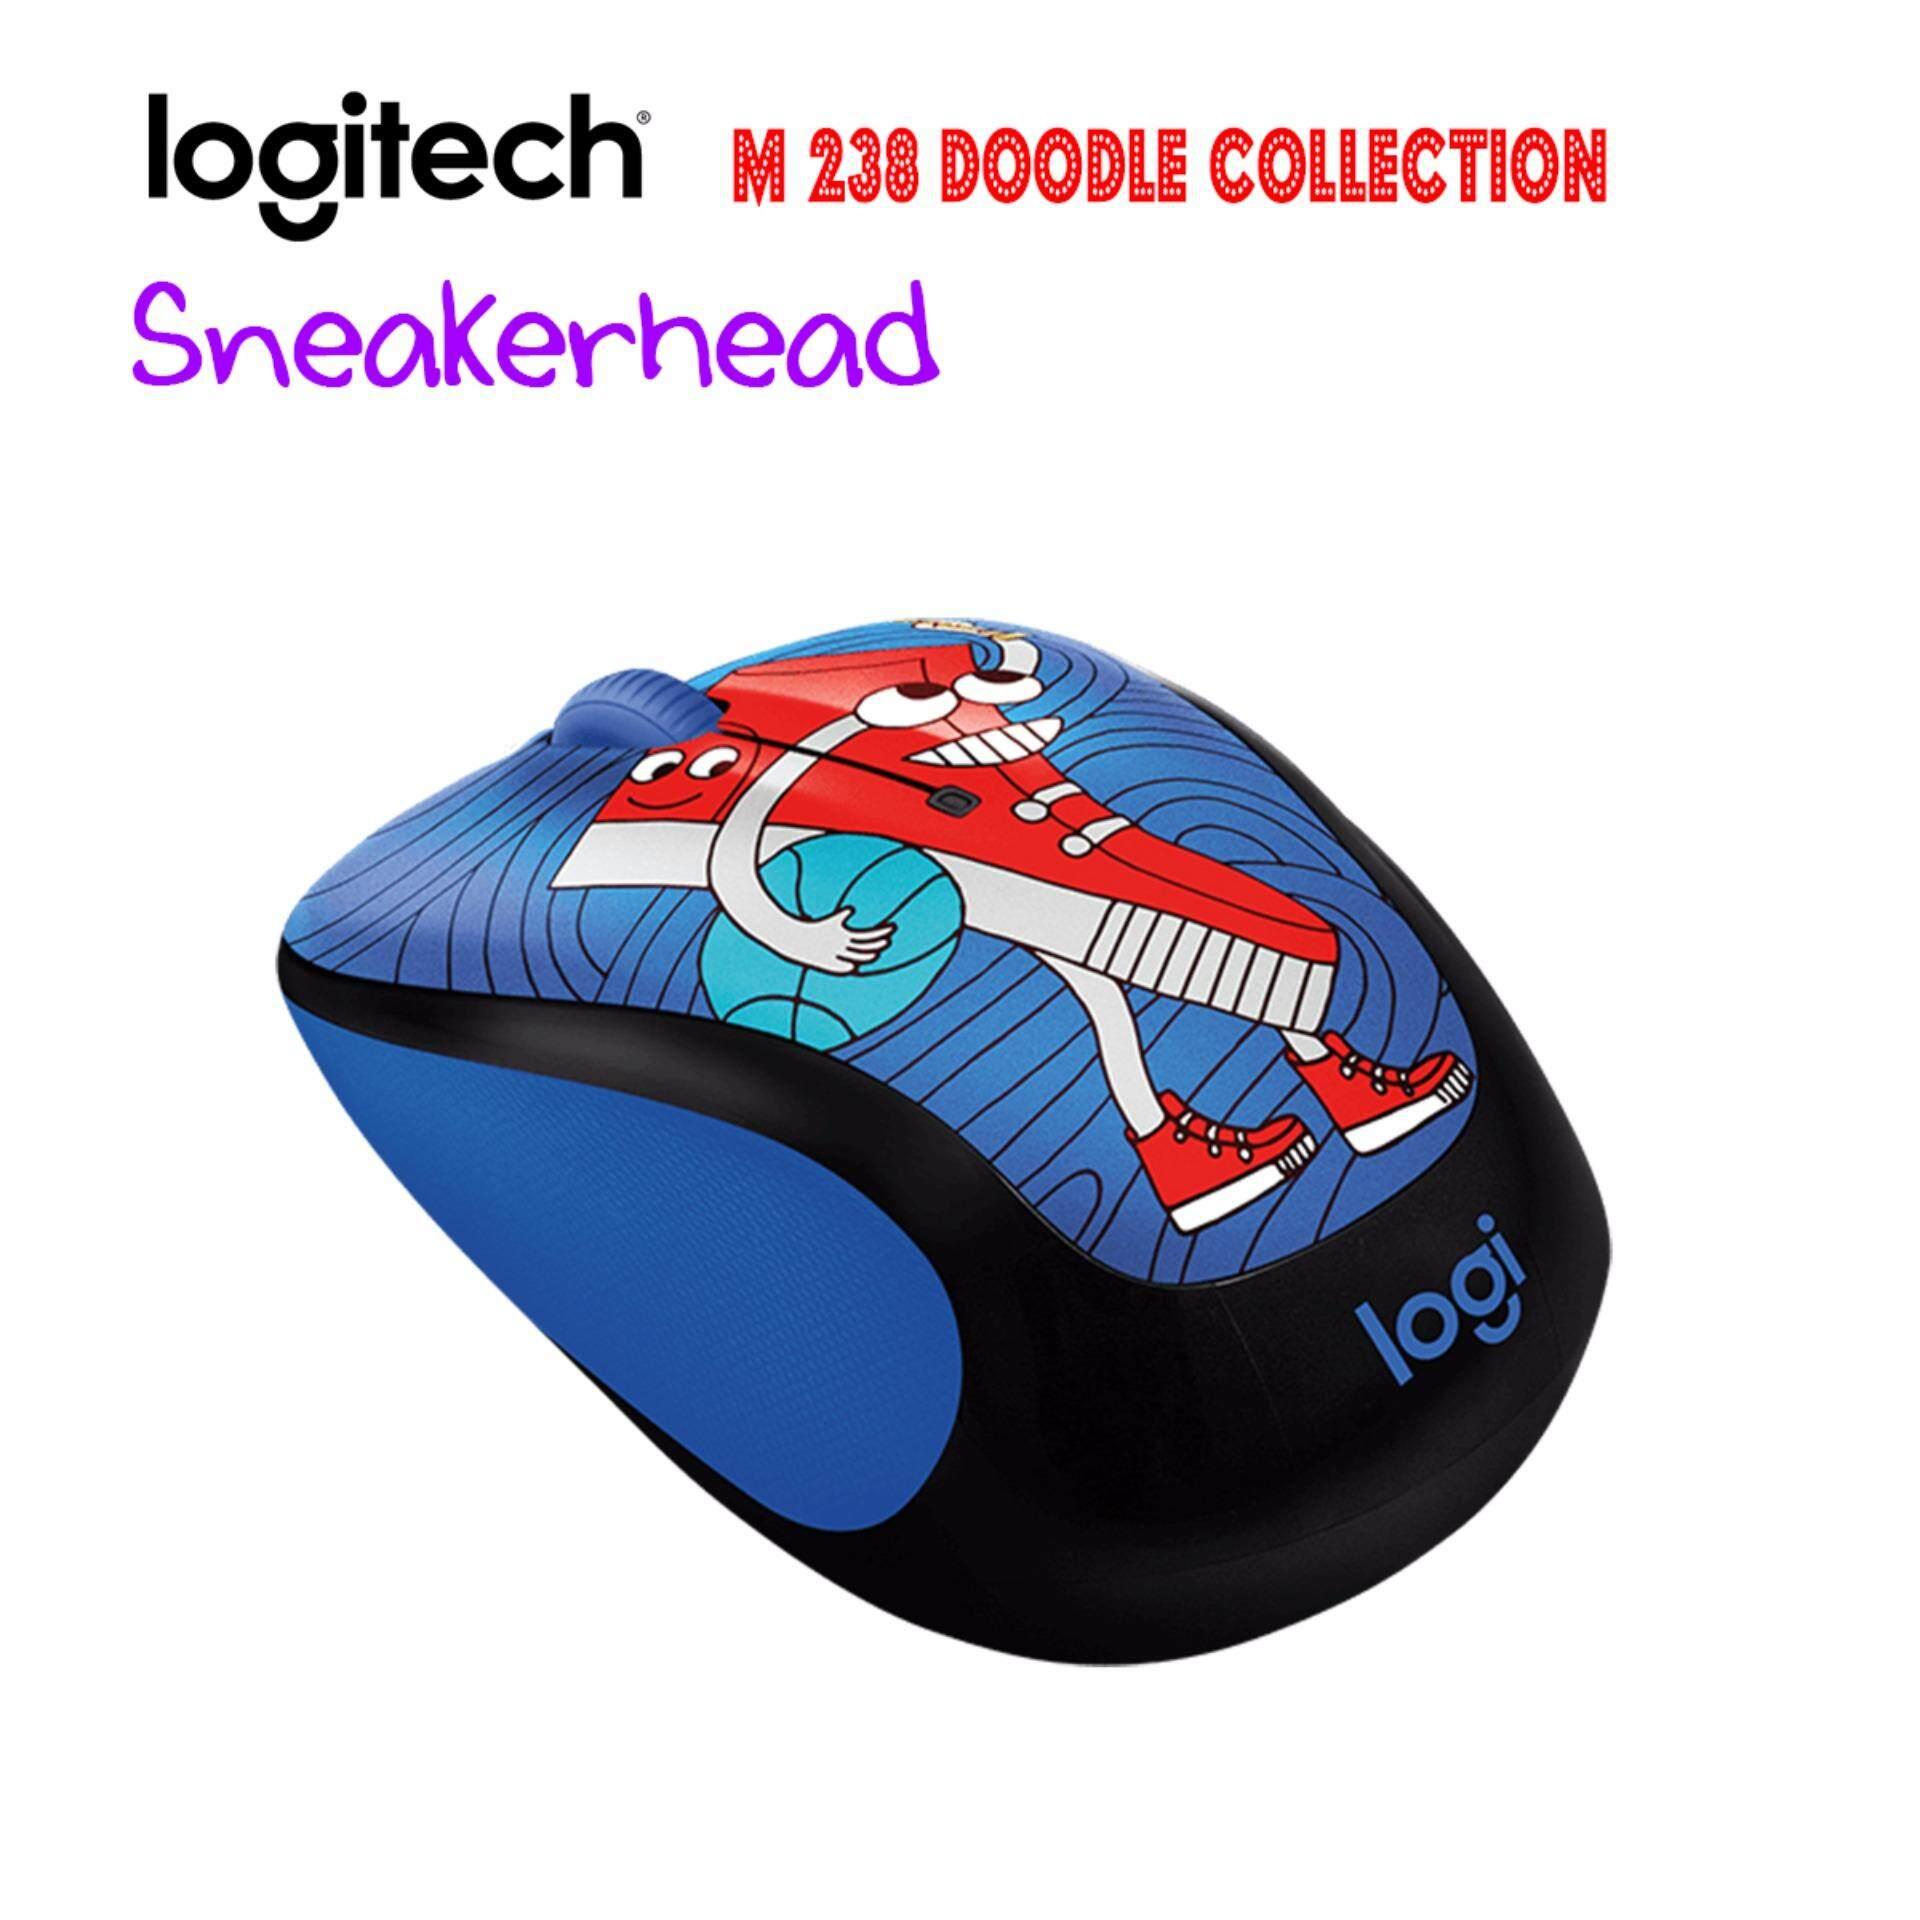 Logitech M238 Doodle Collection Sneakerhead Daftar Harga Terbaru Wireless Mouse Party Toucan